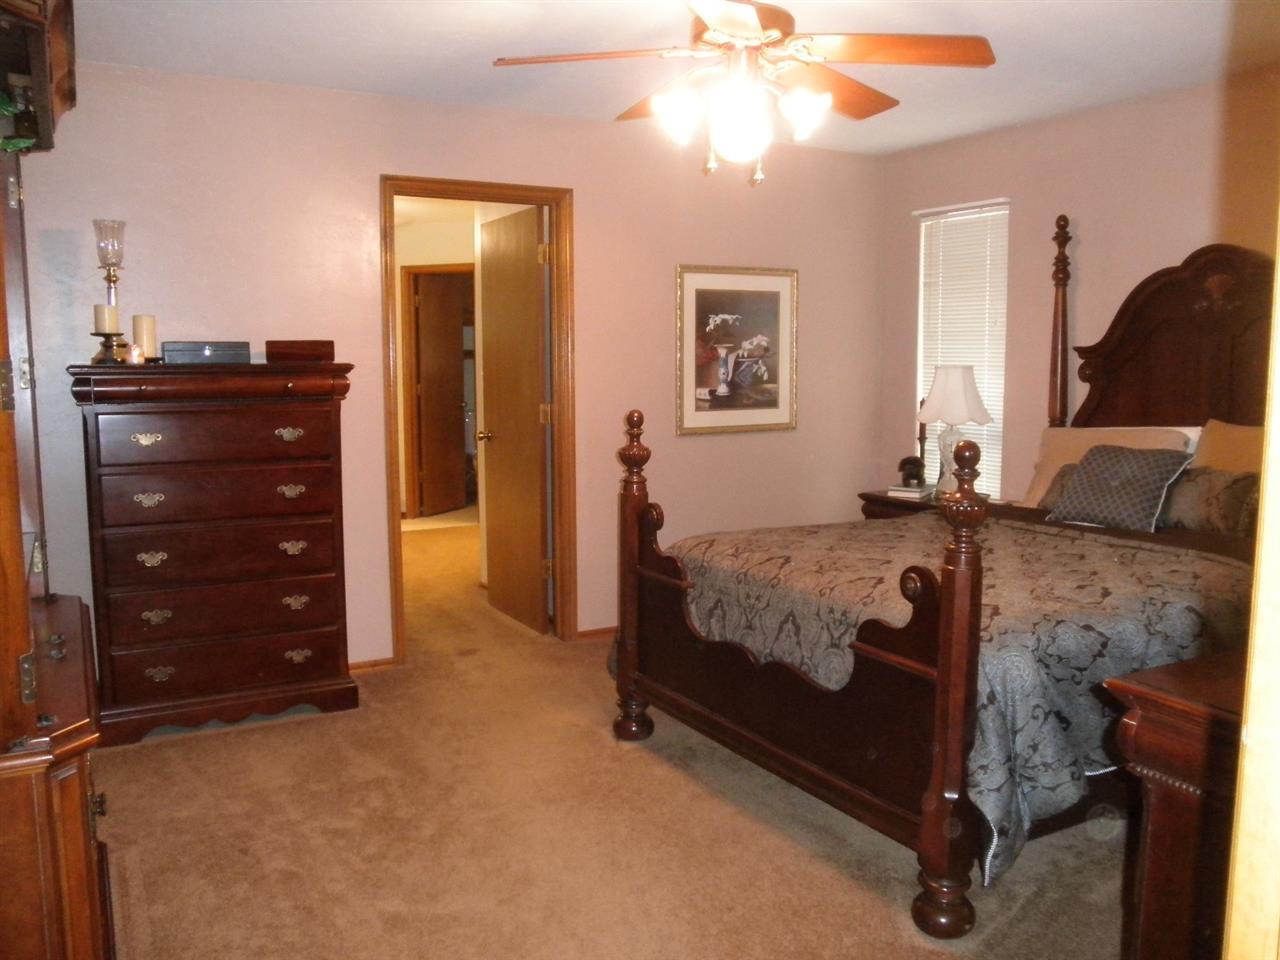 Sold Intraoffice W/MLS | 2800 Green Meadow Ponca City, OK 74604 12